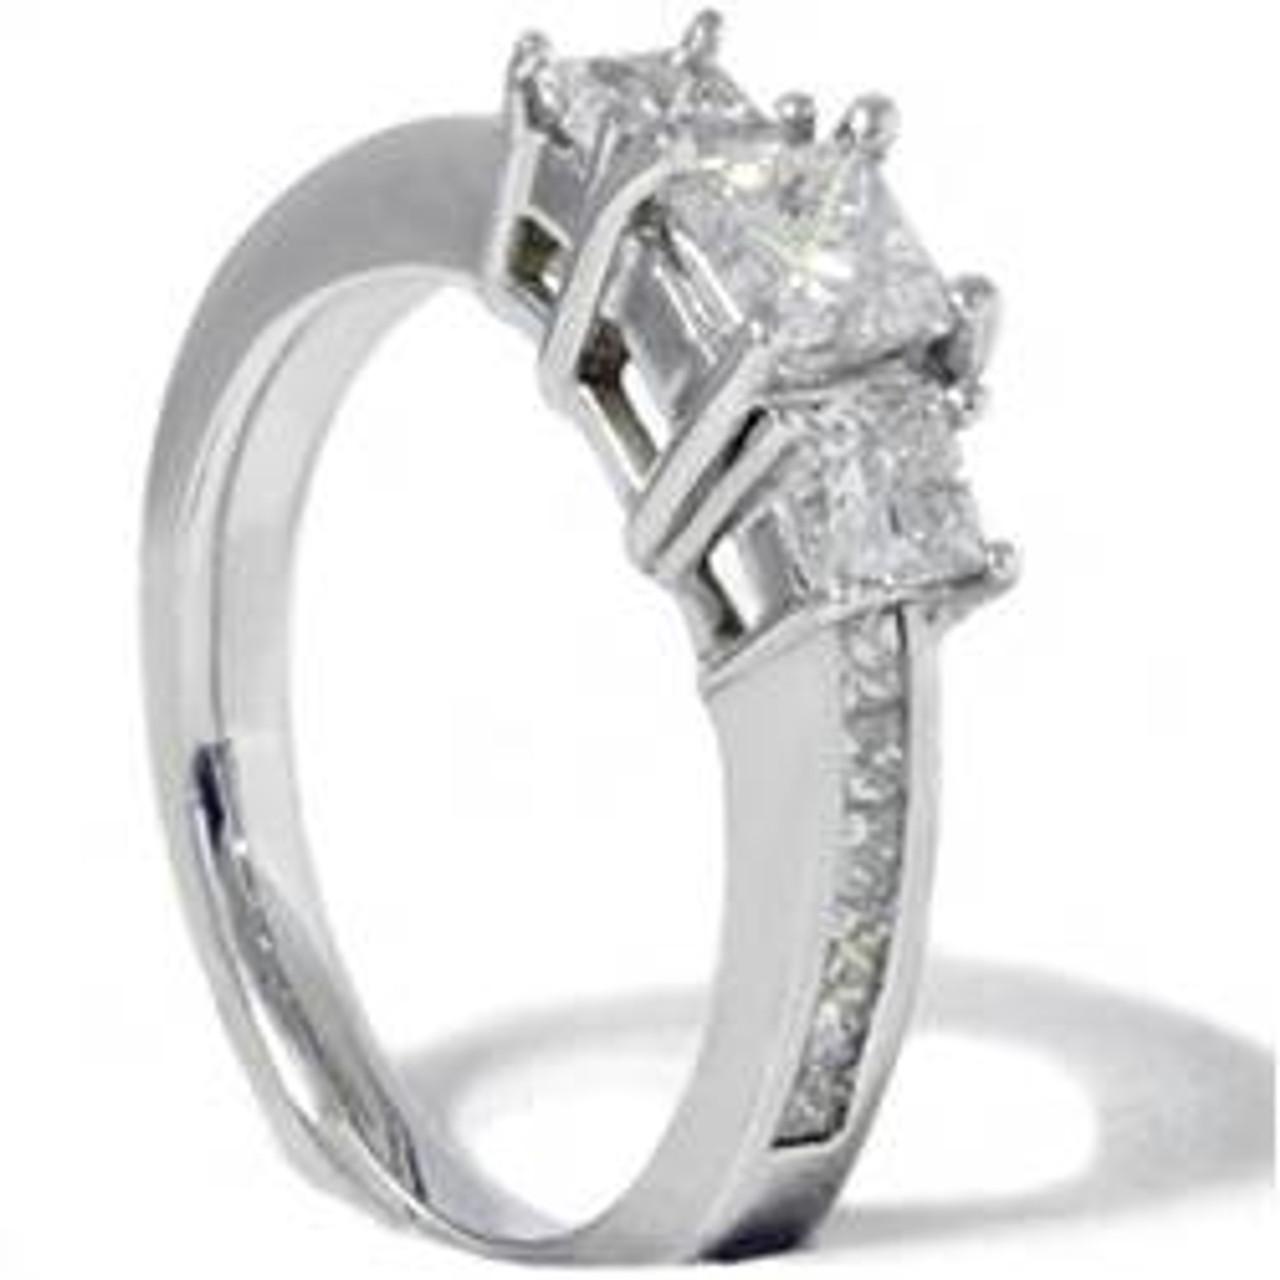 Princess Cut Diamond Engagement Ring 3-Stone 1 1/2ct 14k